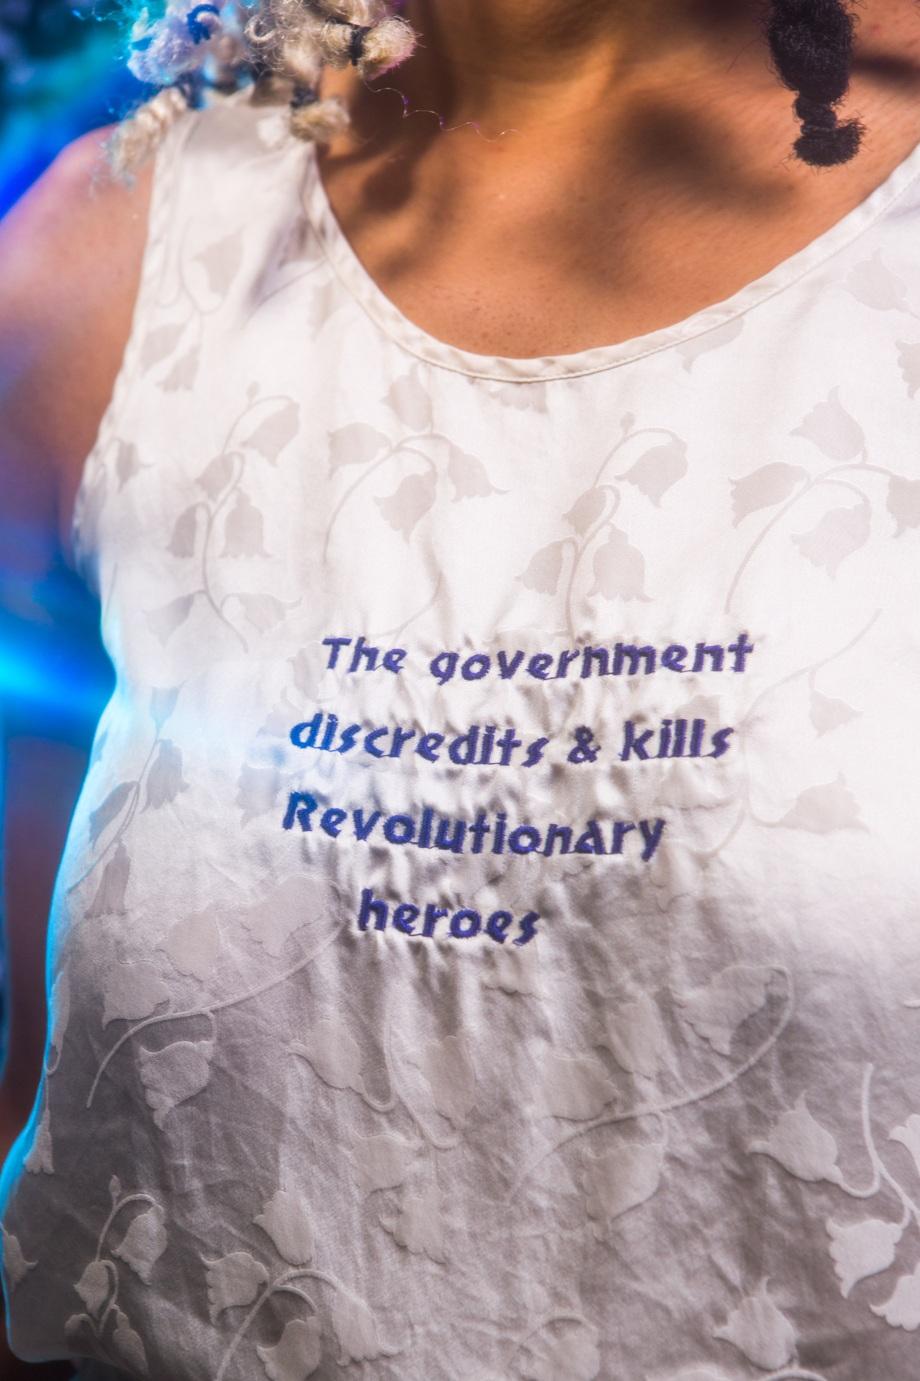 The Government Discredits & Kills Revolutionary Heroes - Tank